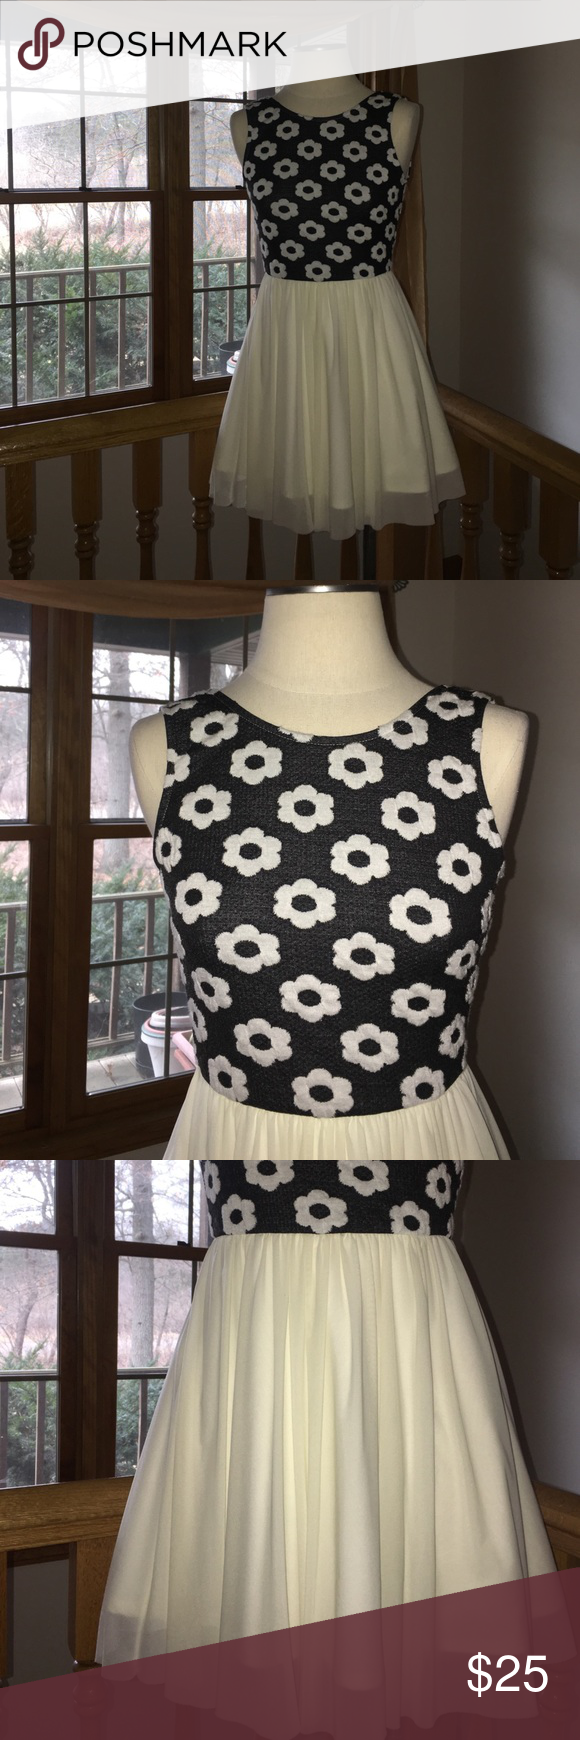 The Vintage Shop Silky Black And Cream Dress Stretchy Dress Cream Dress Dresses [ 1740 x 580 Pixel ]